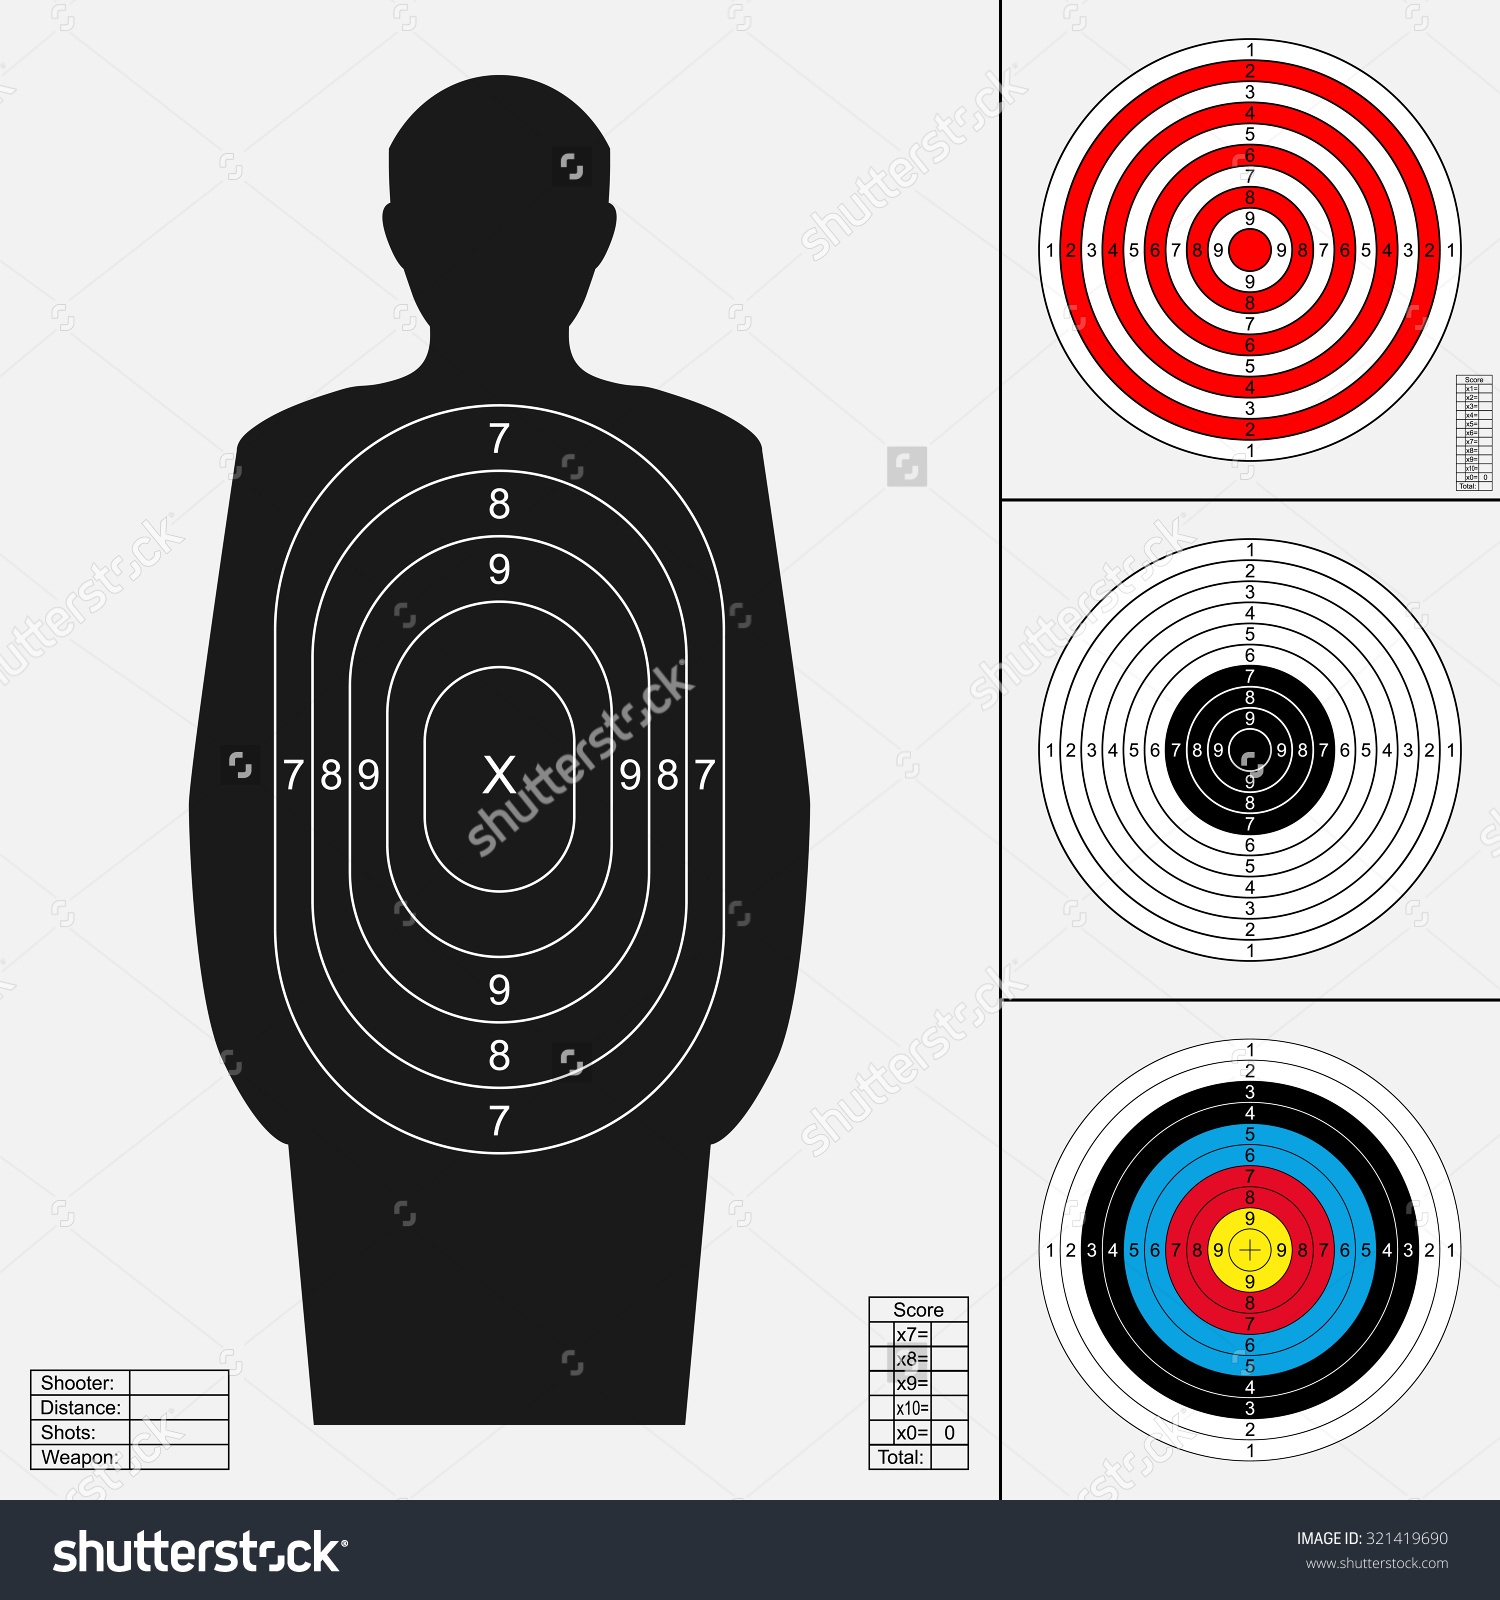 Target on body shot arrow clipart image transparent download Shooting Target Set Silhouette Human Archery Stock Vector ... image transparent download